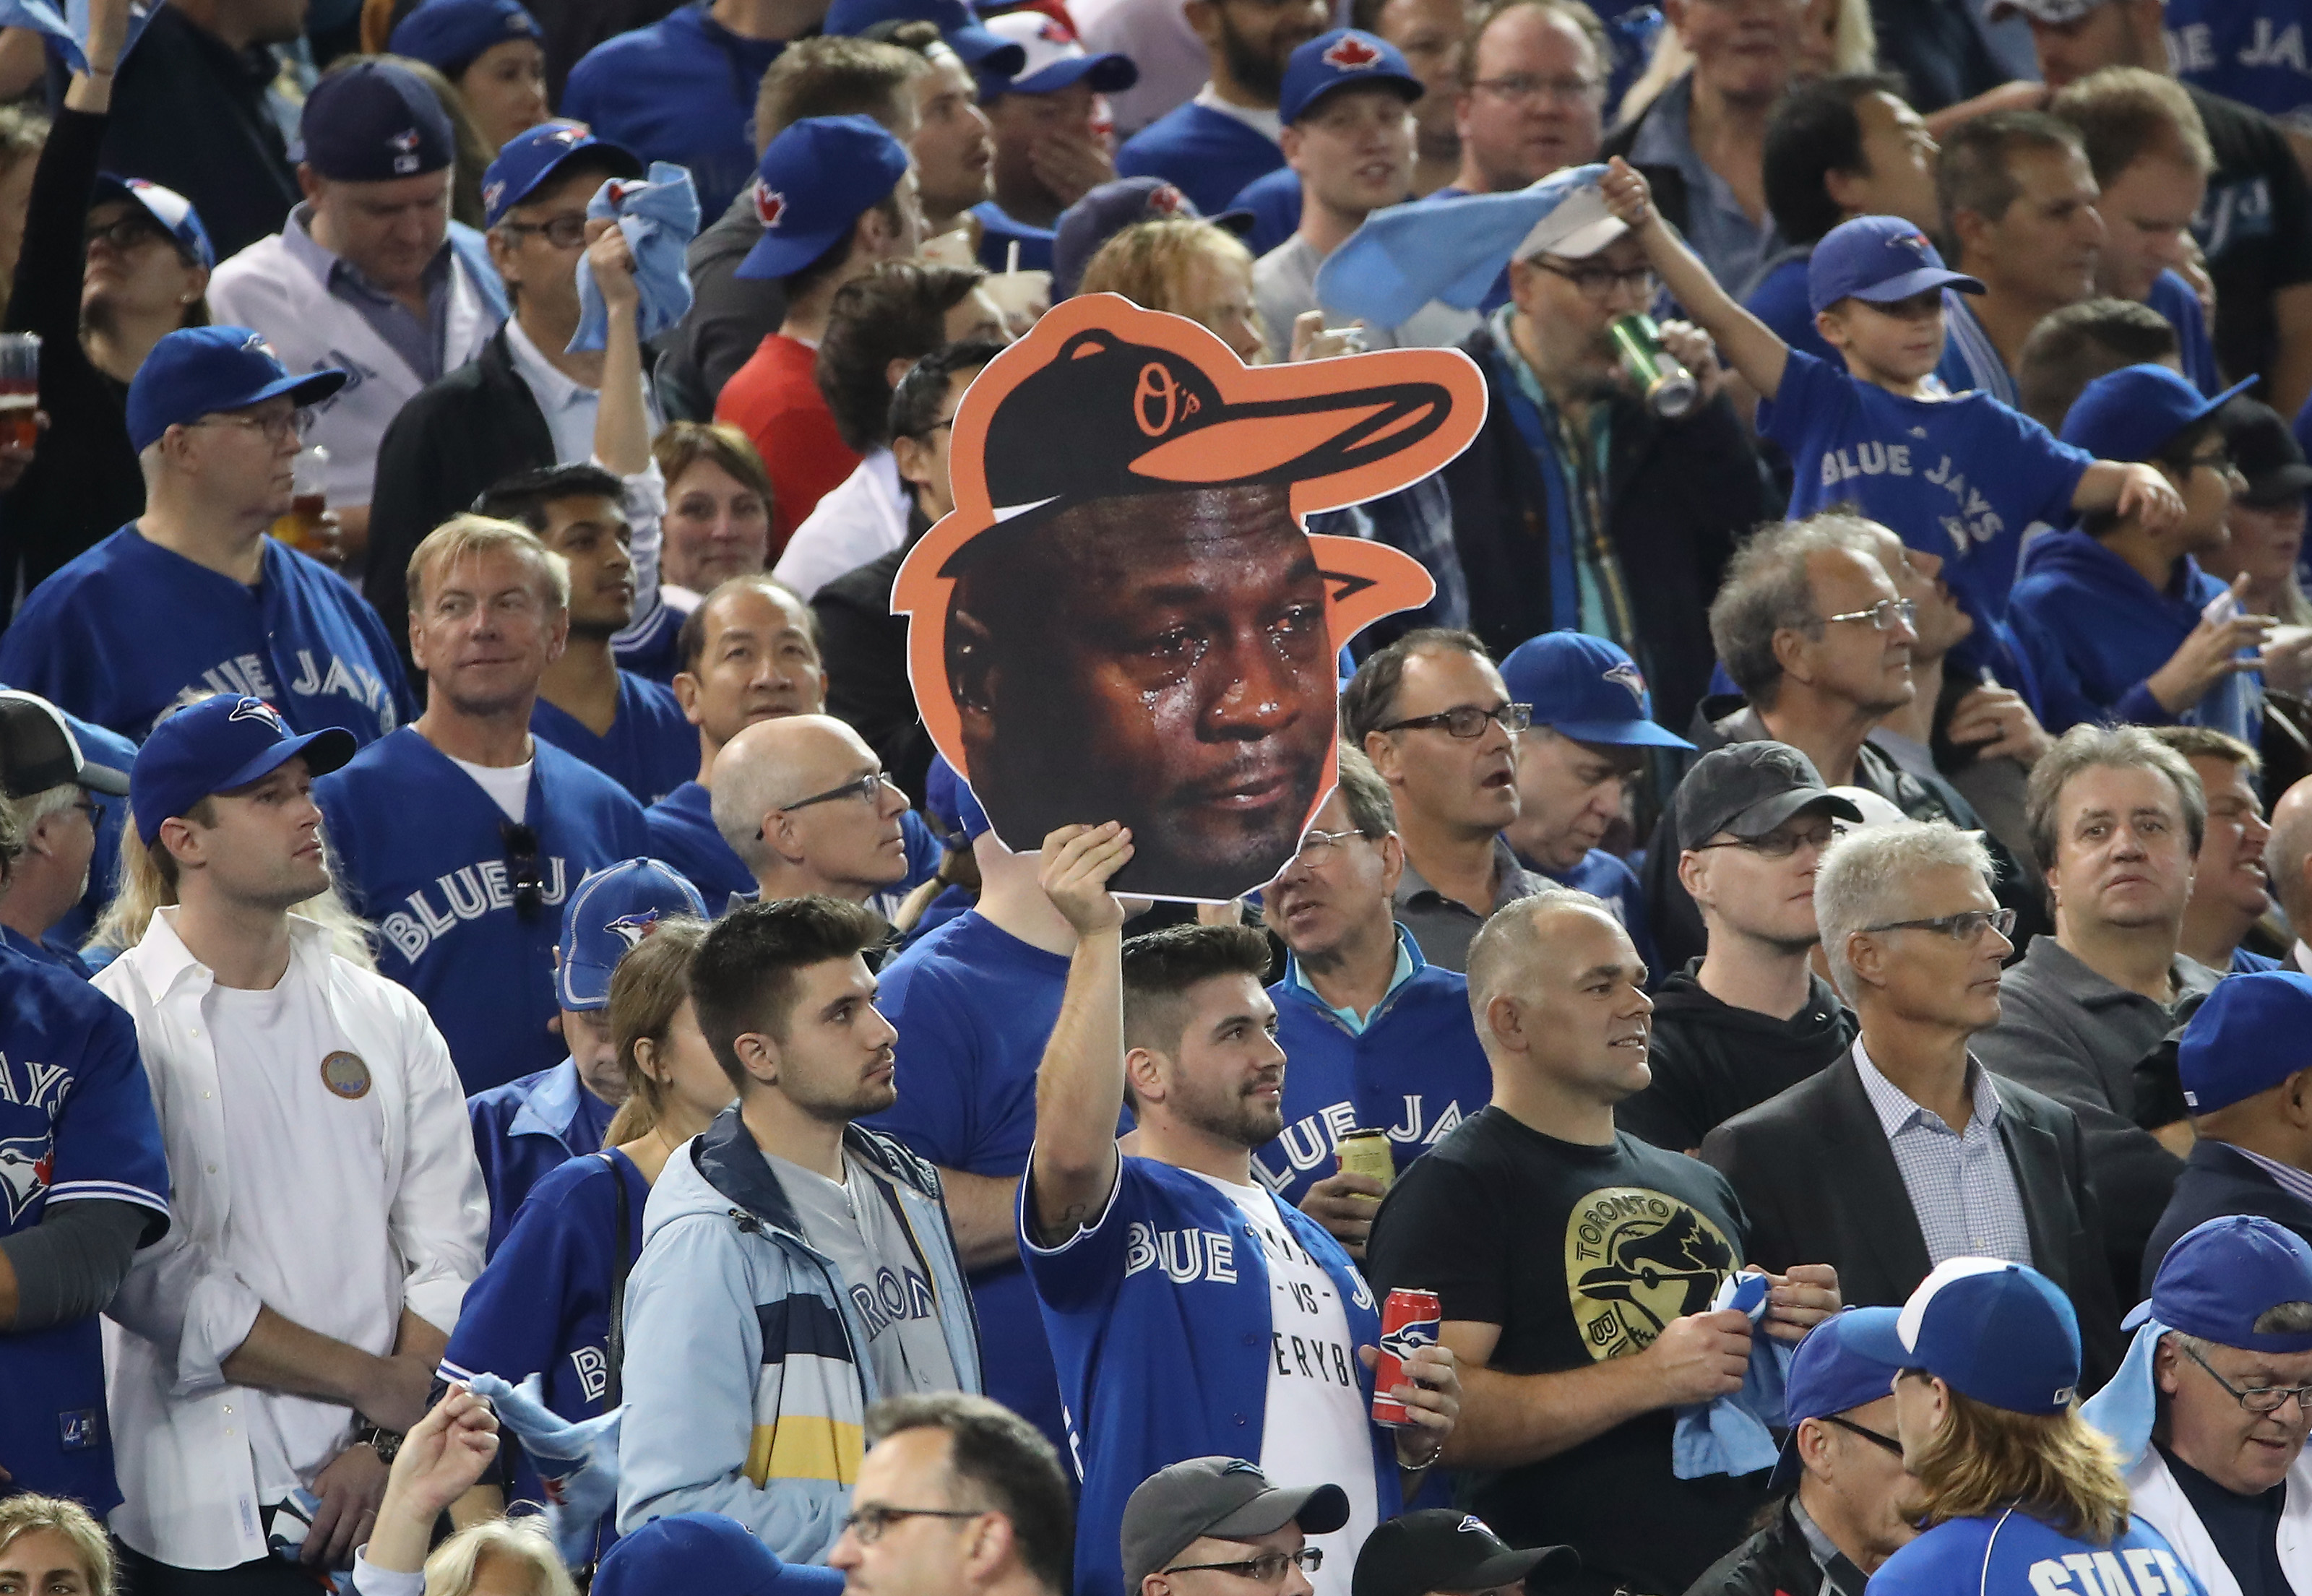 Wild Card Game - Baltimore Orioles v Toronto Blue Jays